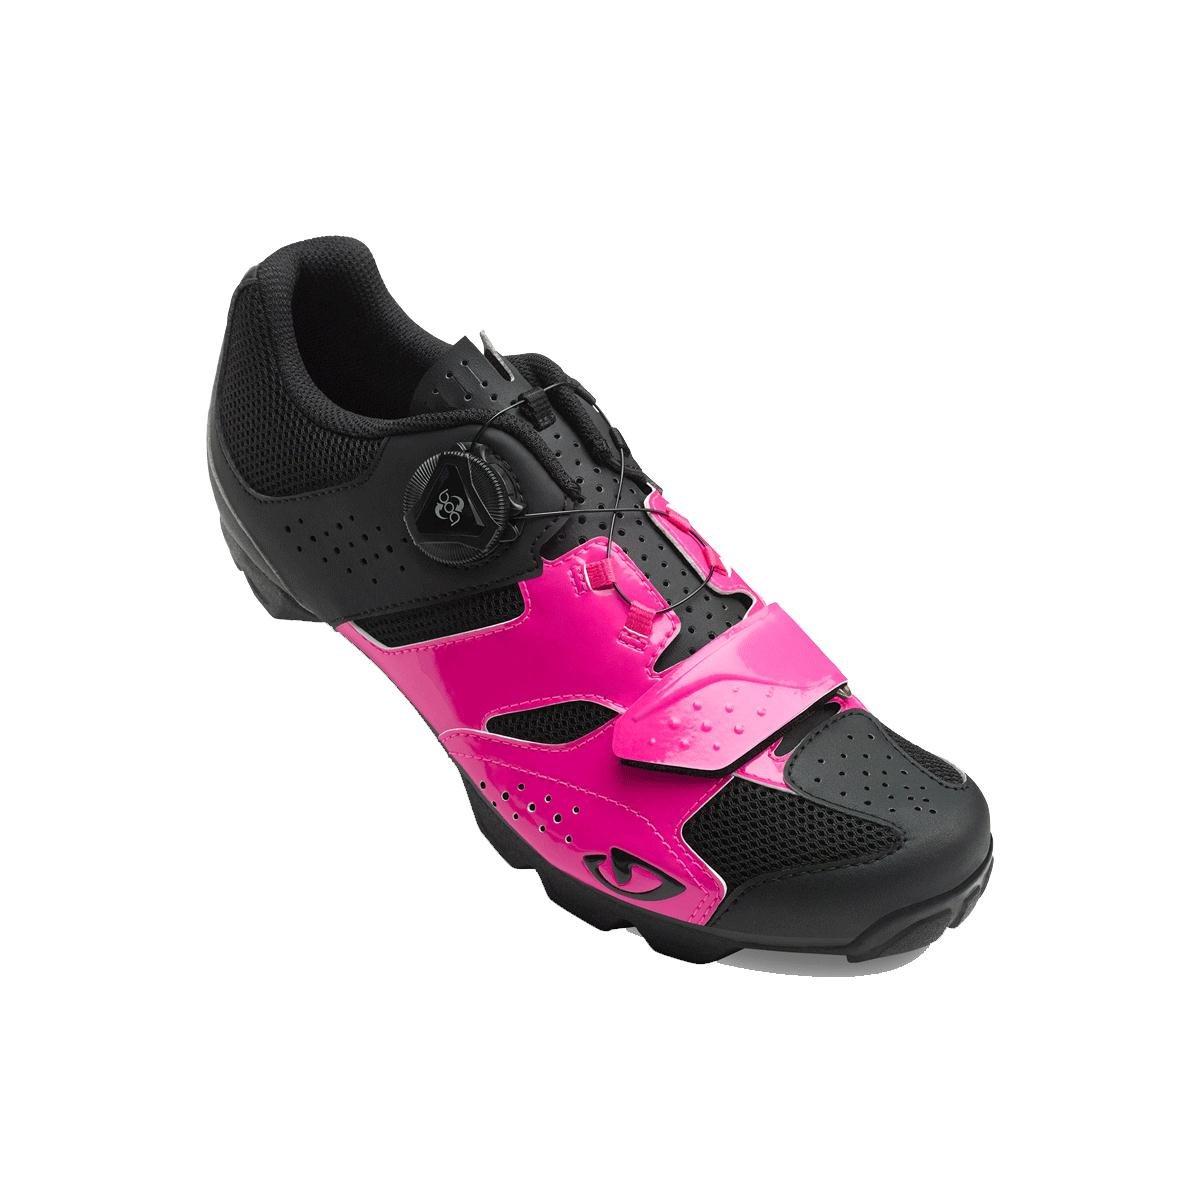 Giro Cylinder Cycling Shoes - Women's Bright Pink/Black 36